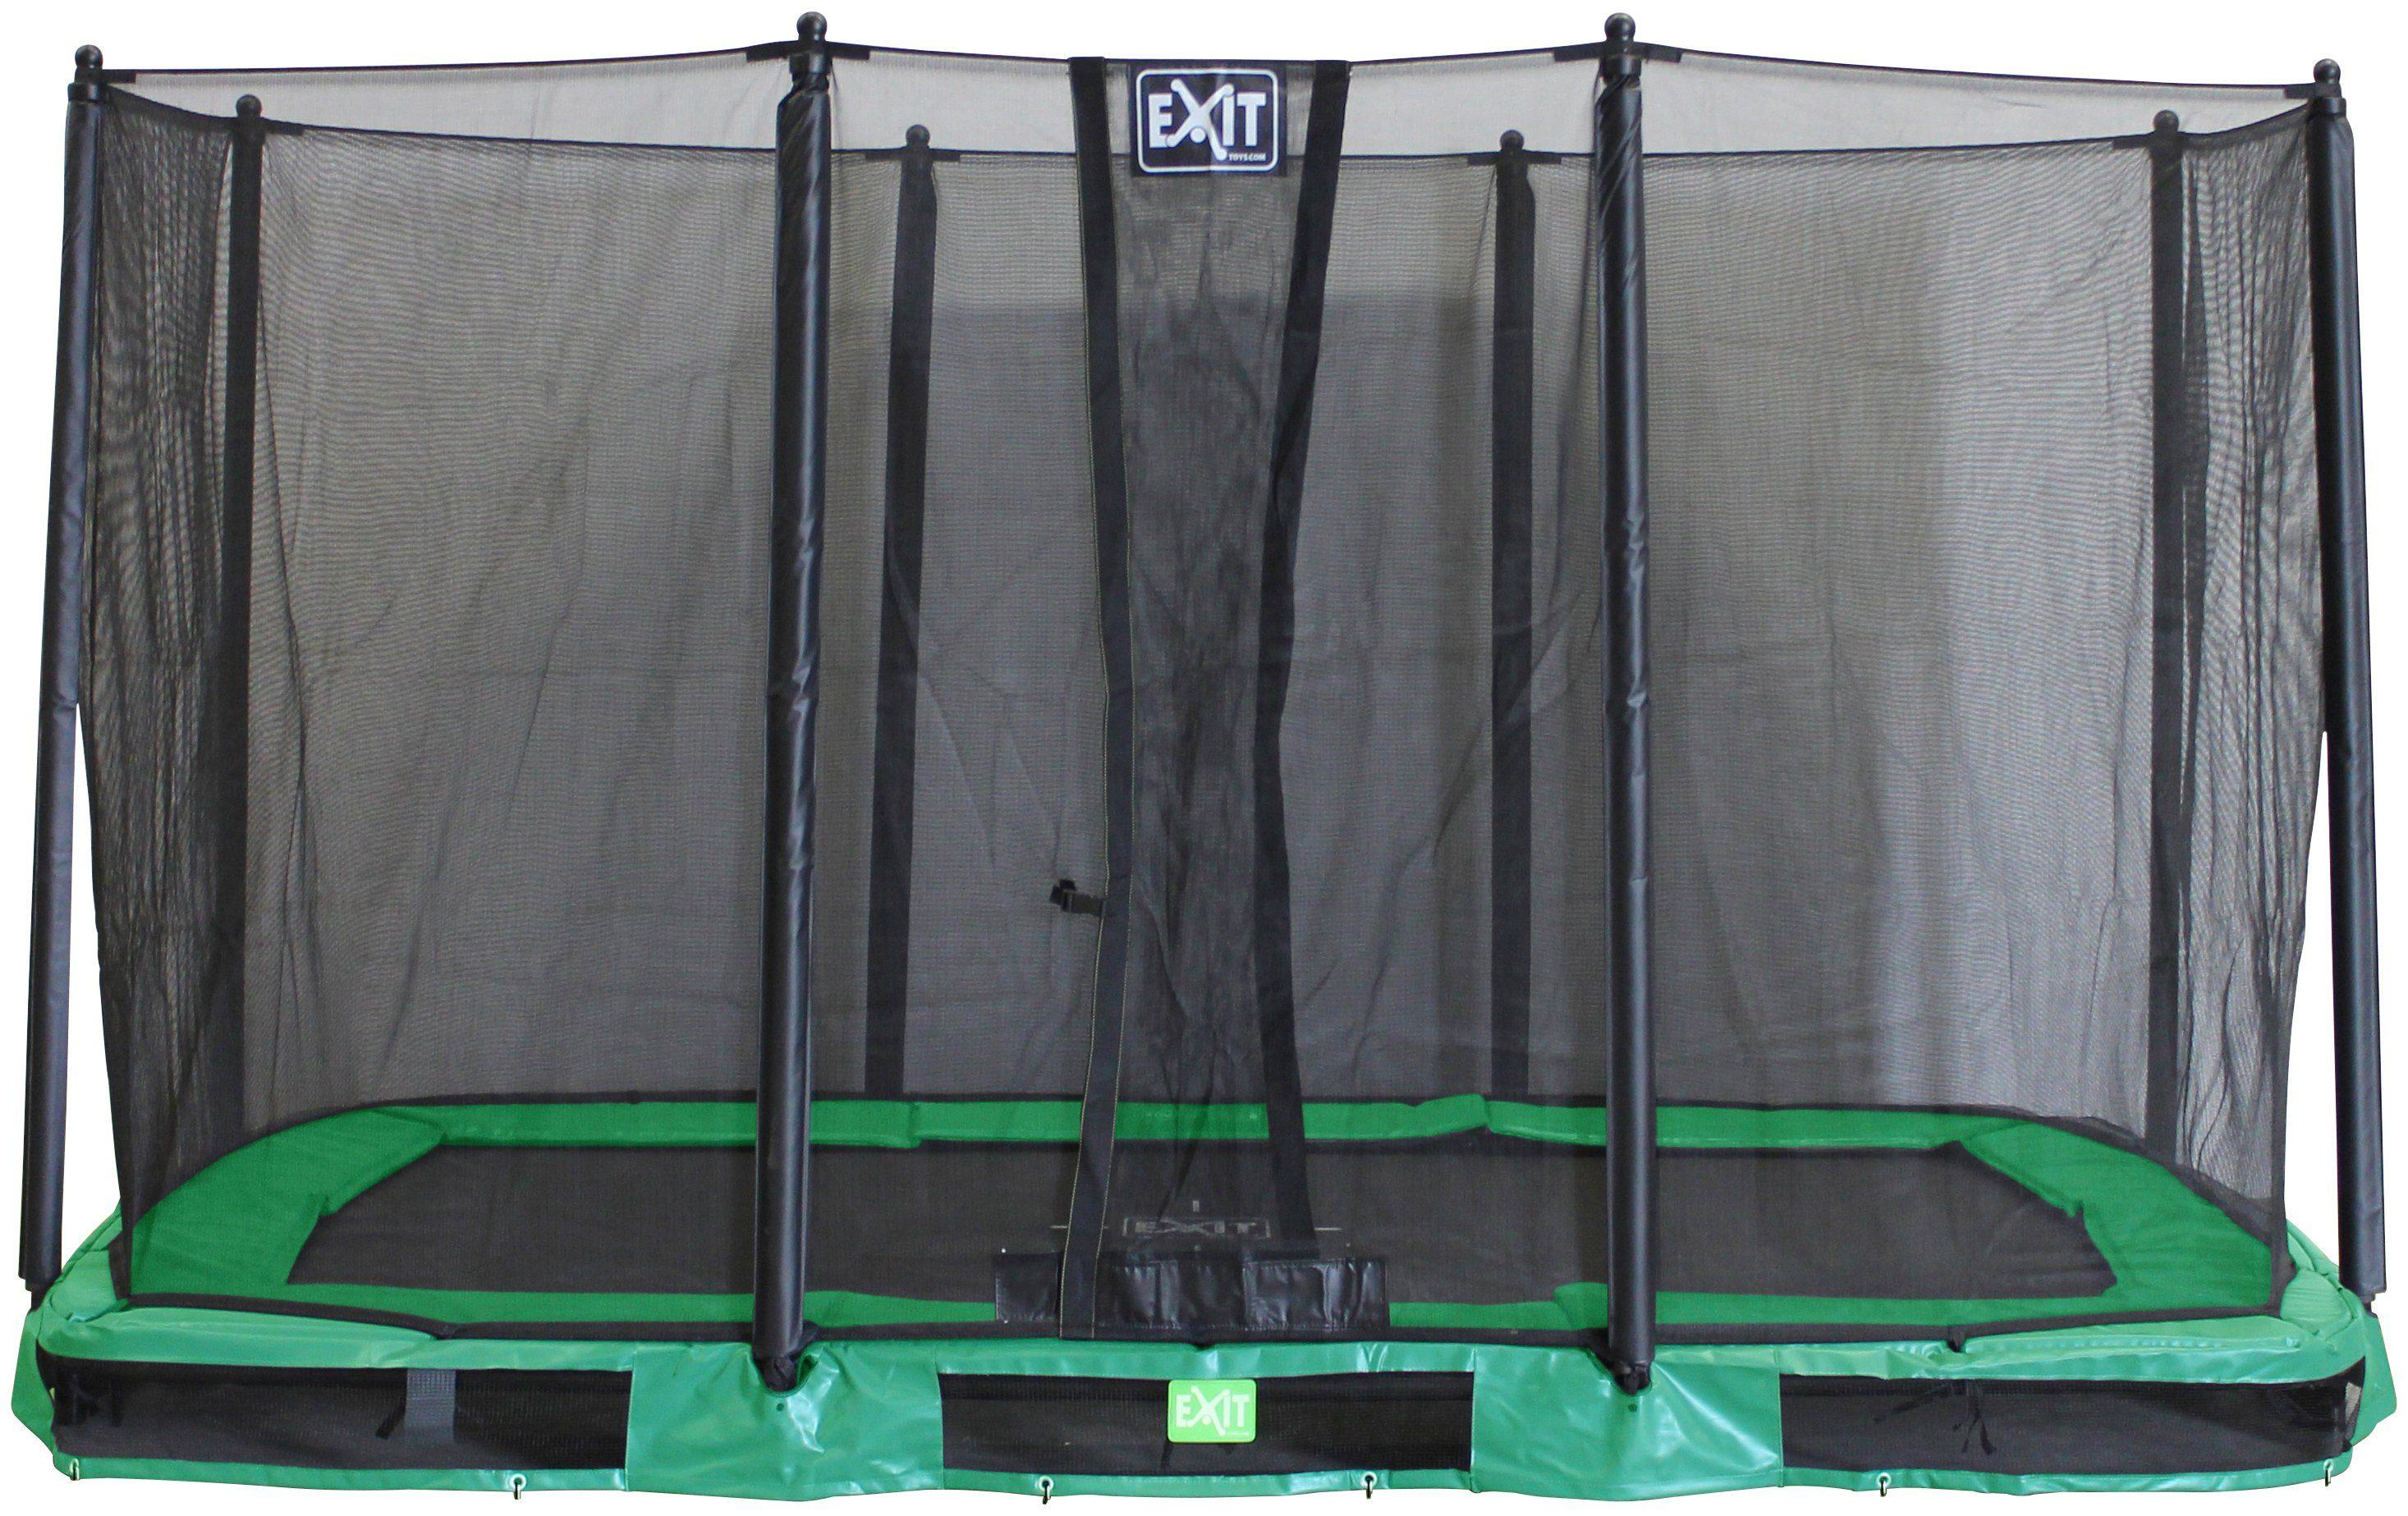 EXIT Trampolin »InTerra«, grün, BxT: 366x214 cm